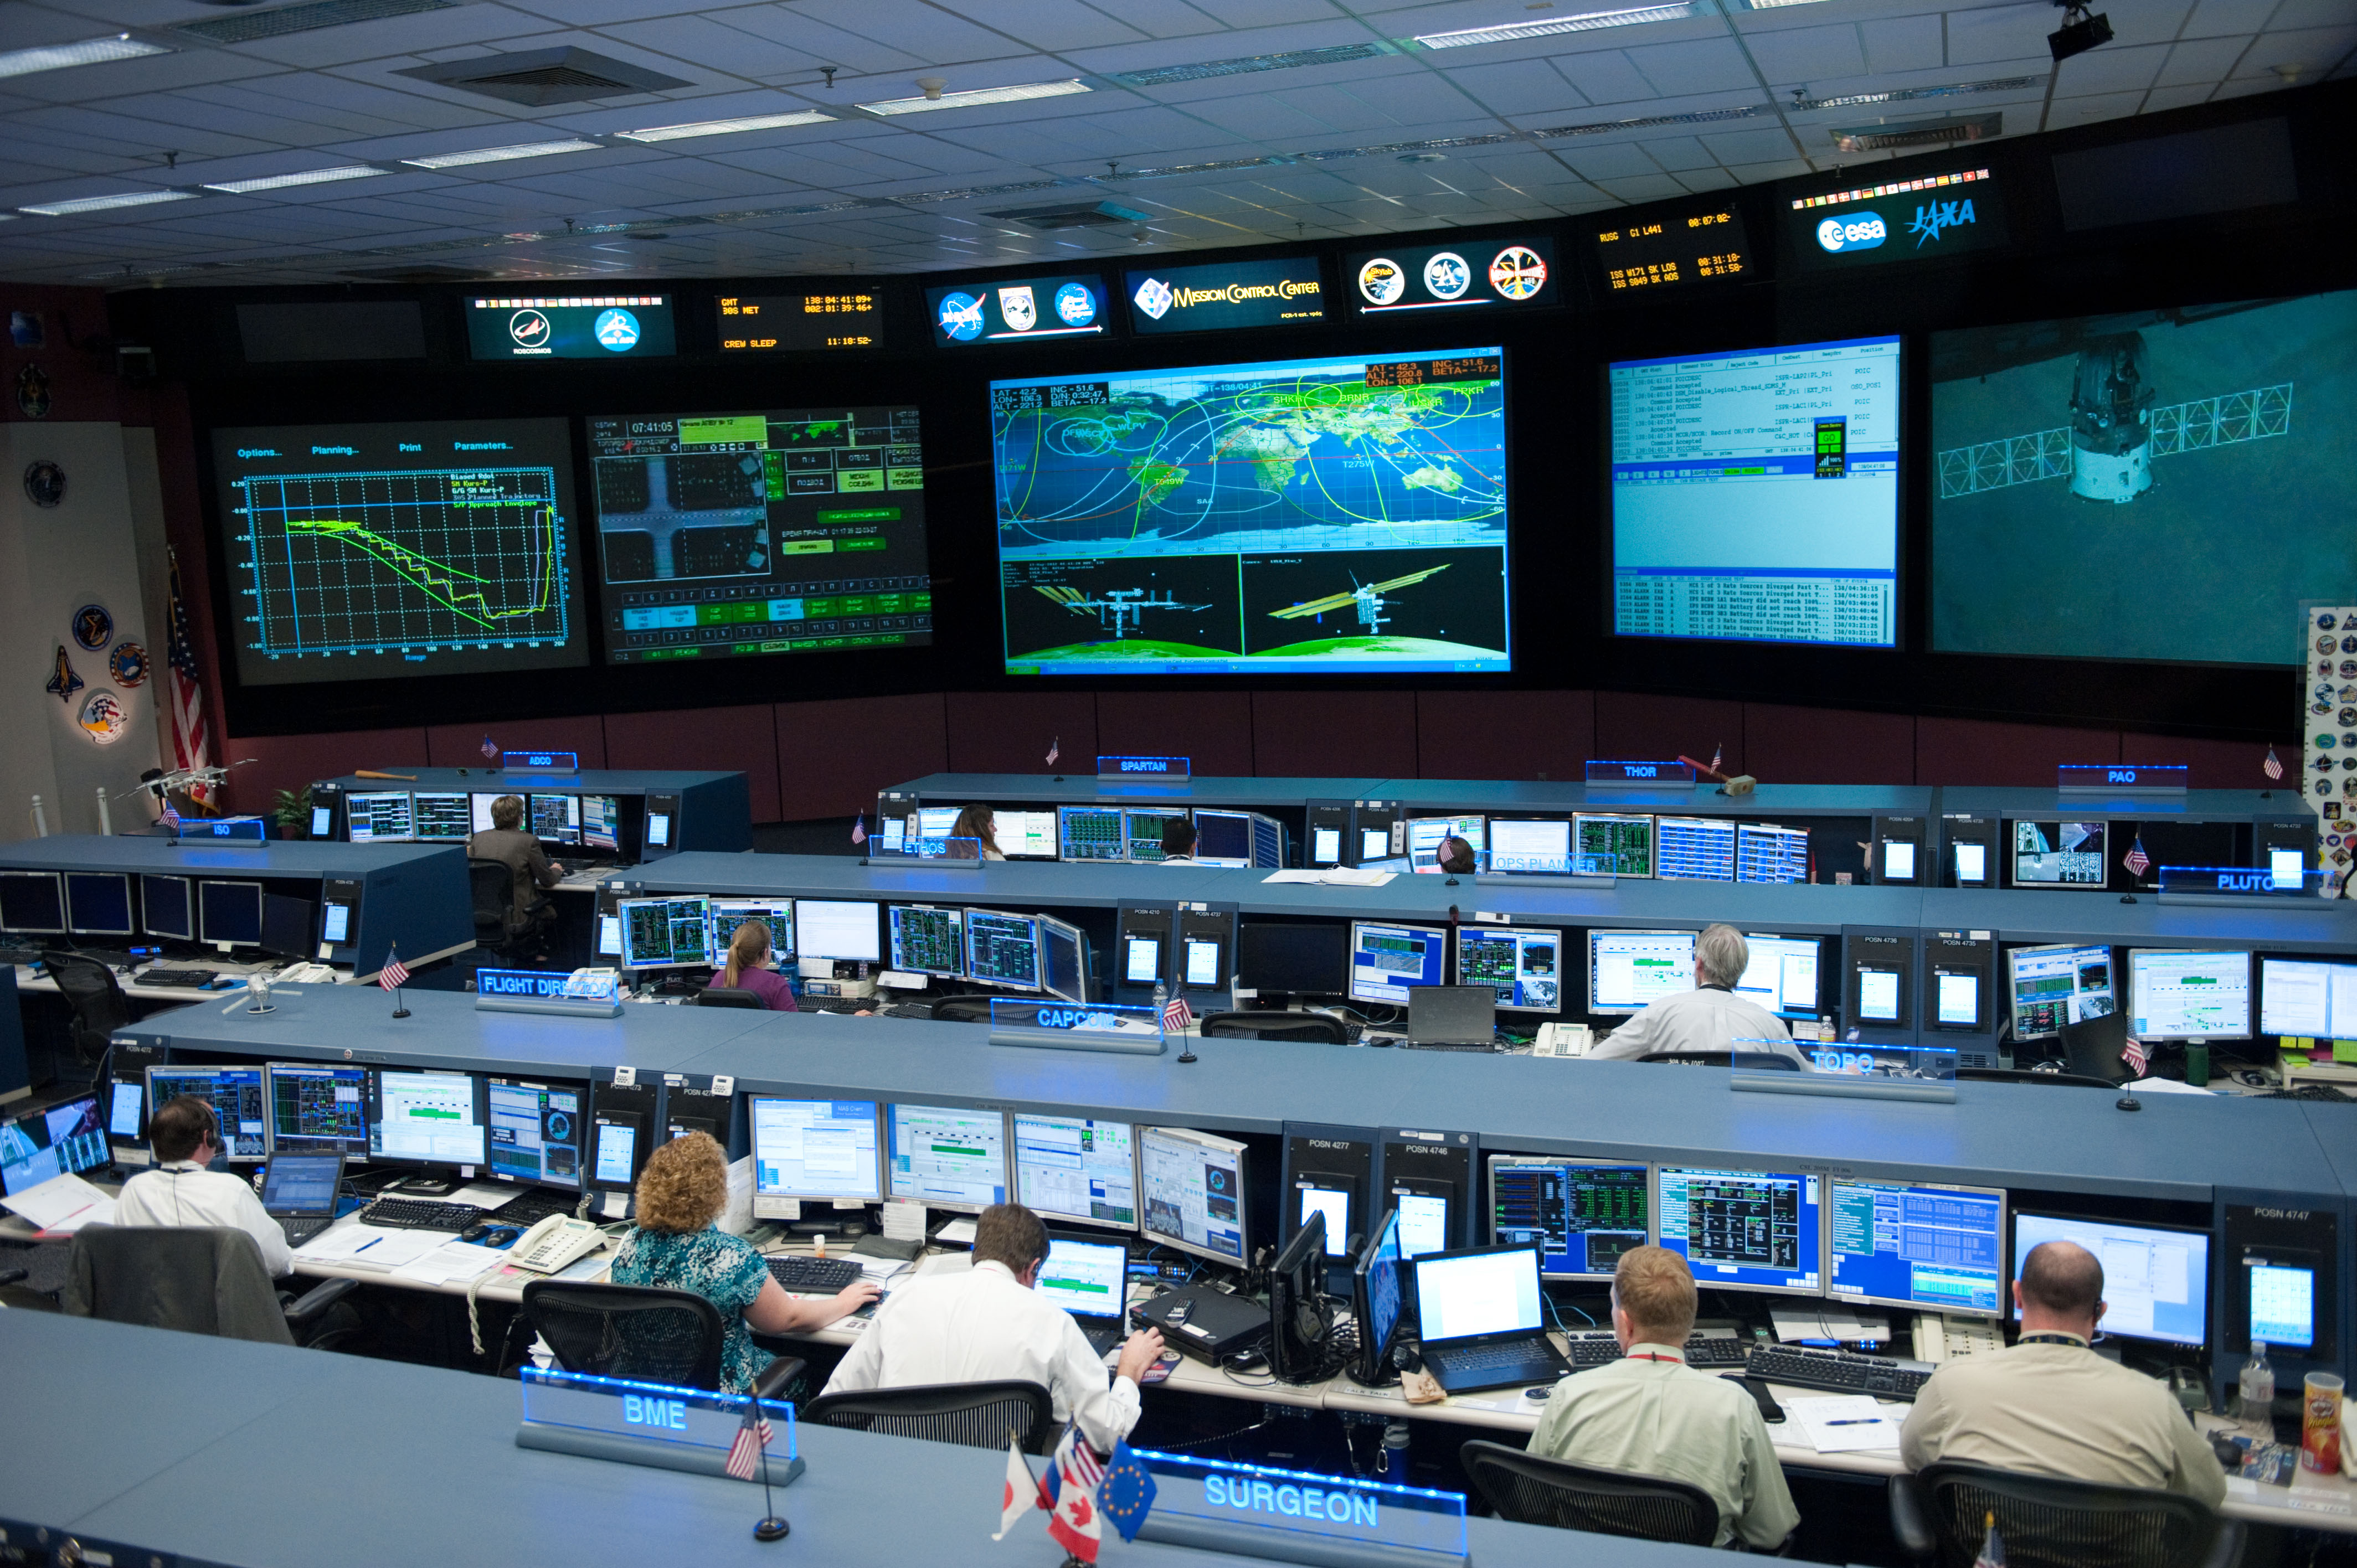 Nasa Space Station Flight Control Room